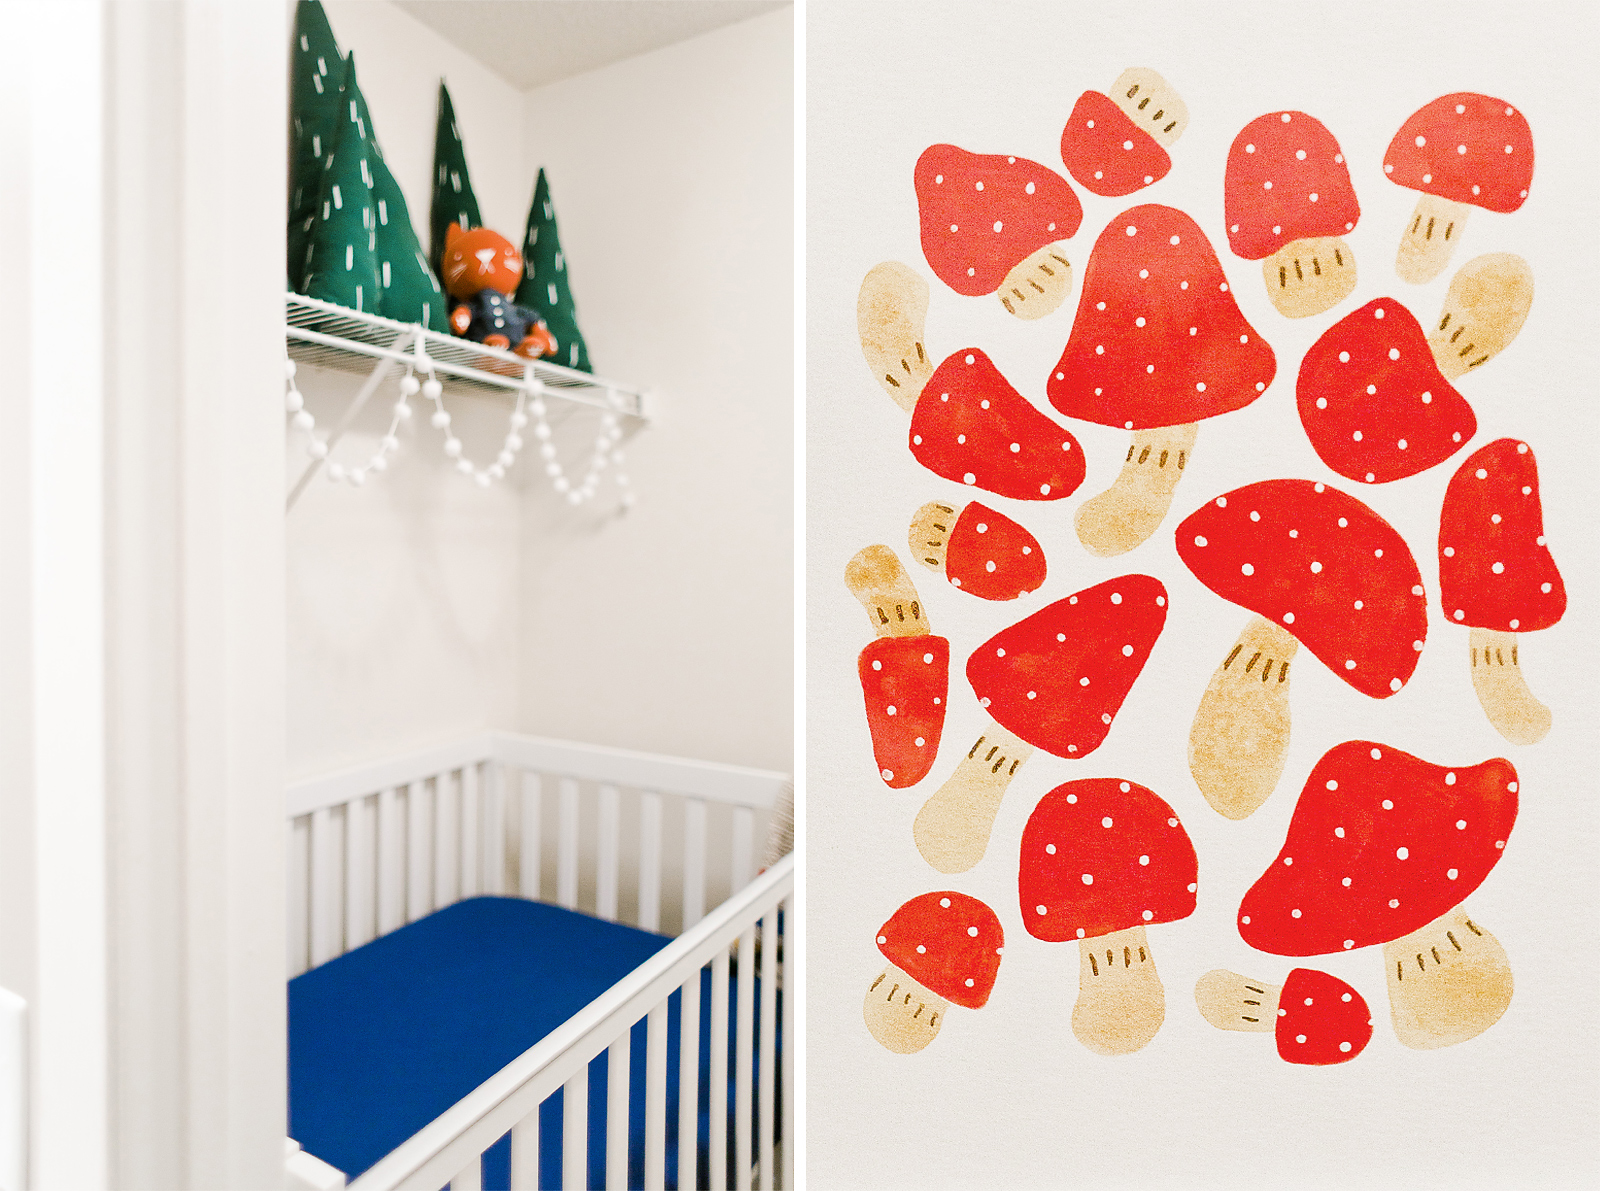 closet_baby_nursery_018.jpg